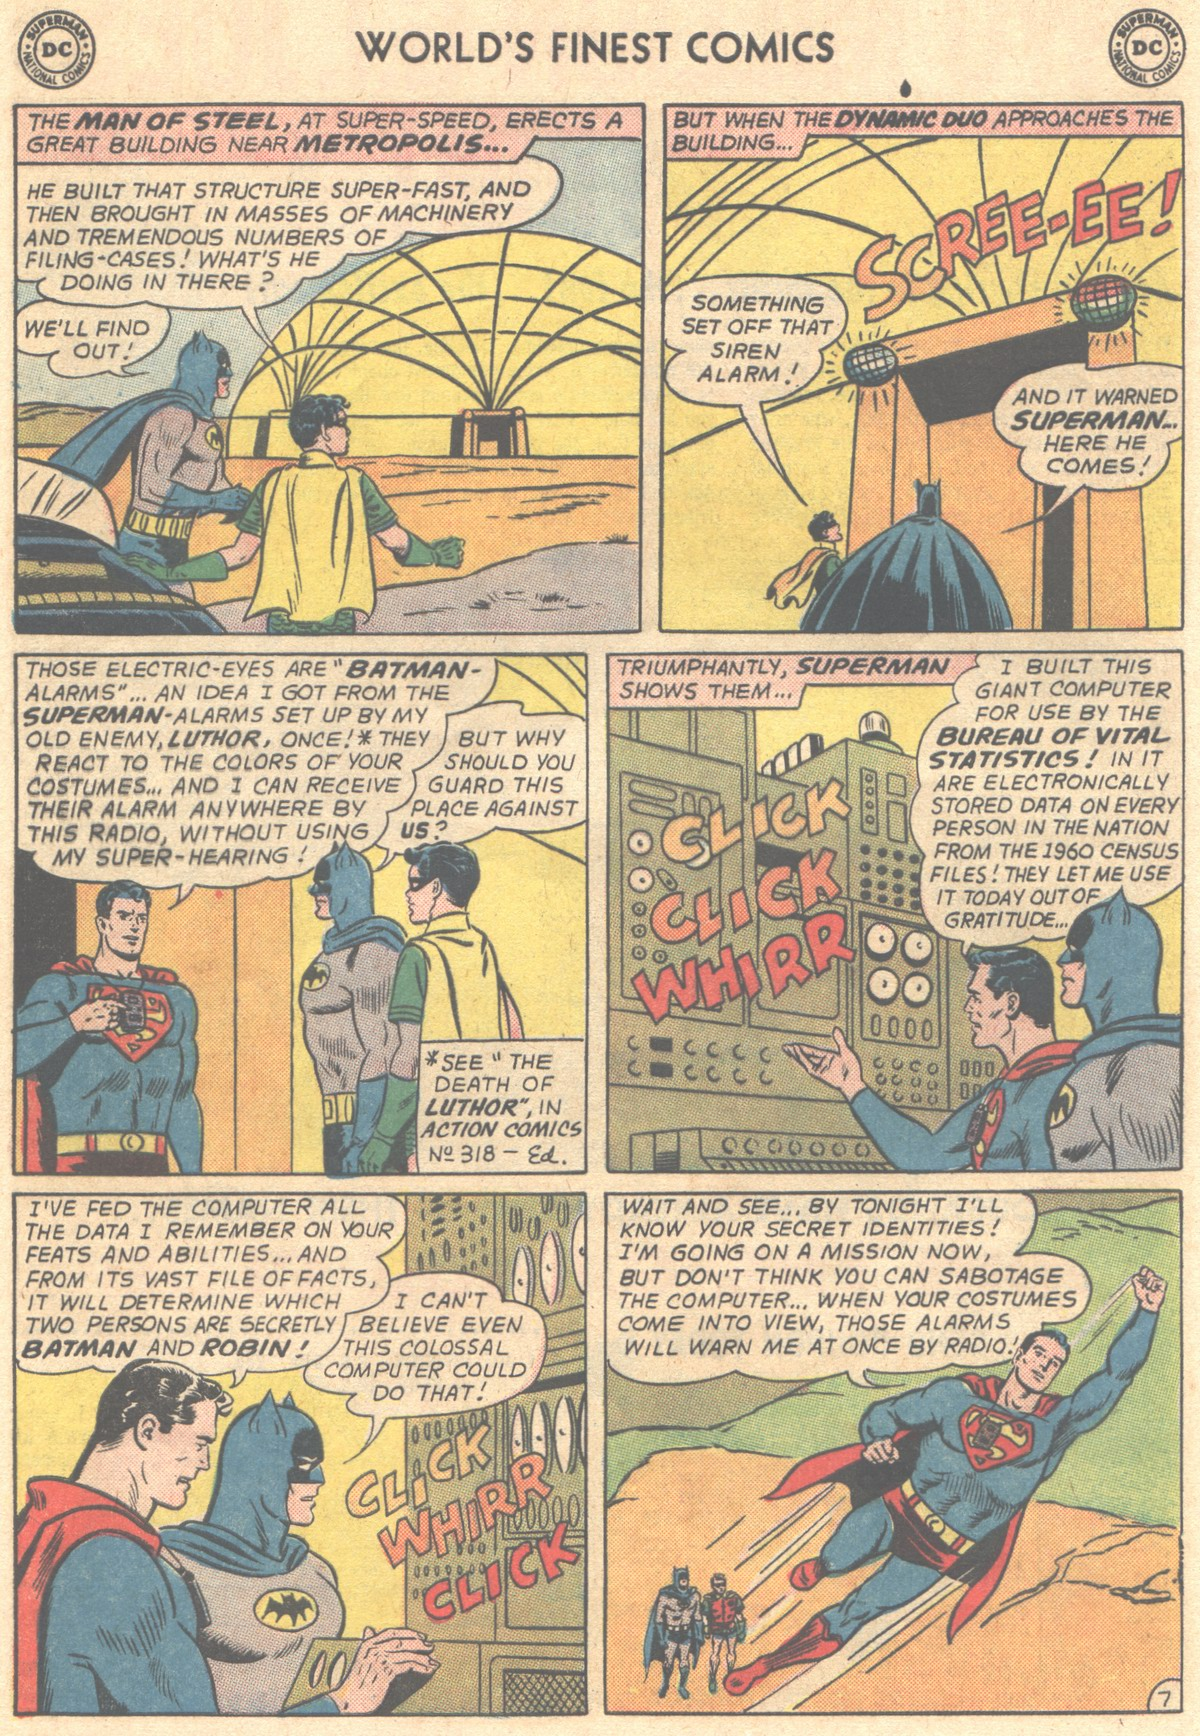 Read online World's Finest Comics comic -  Issue #149 - 24